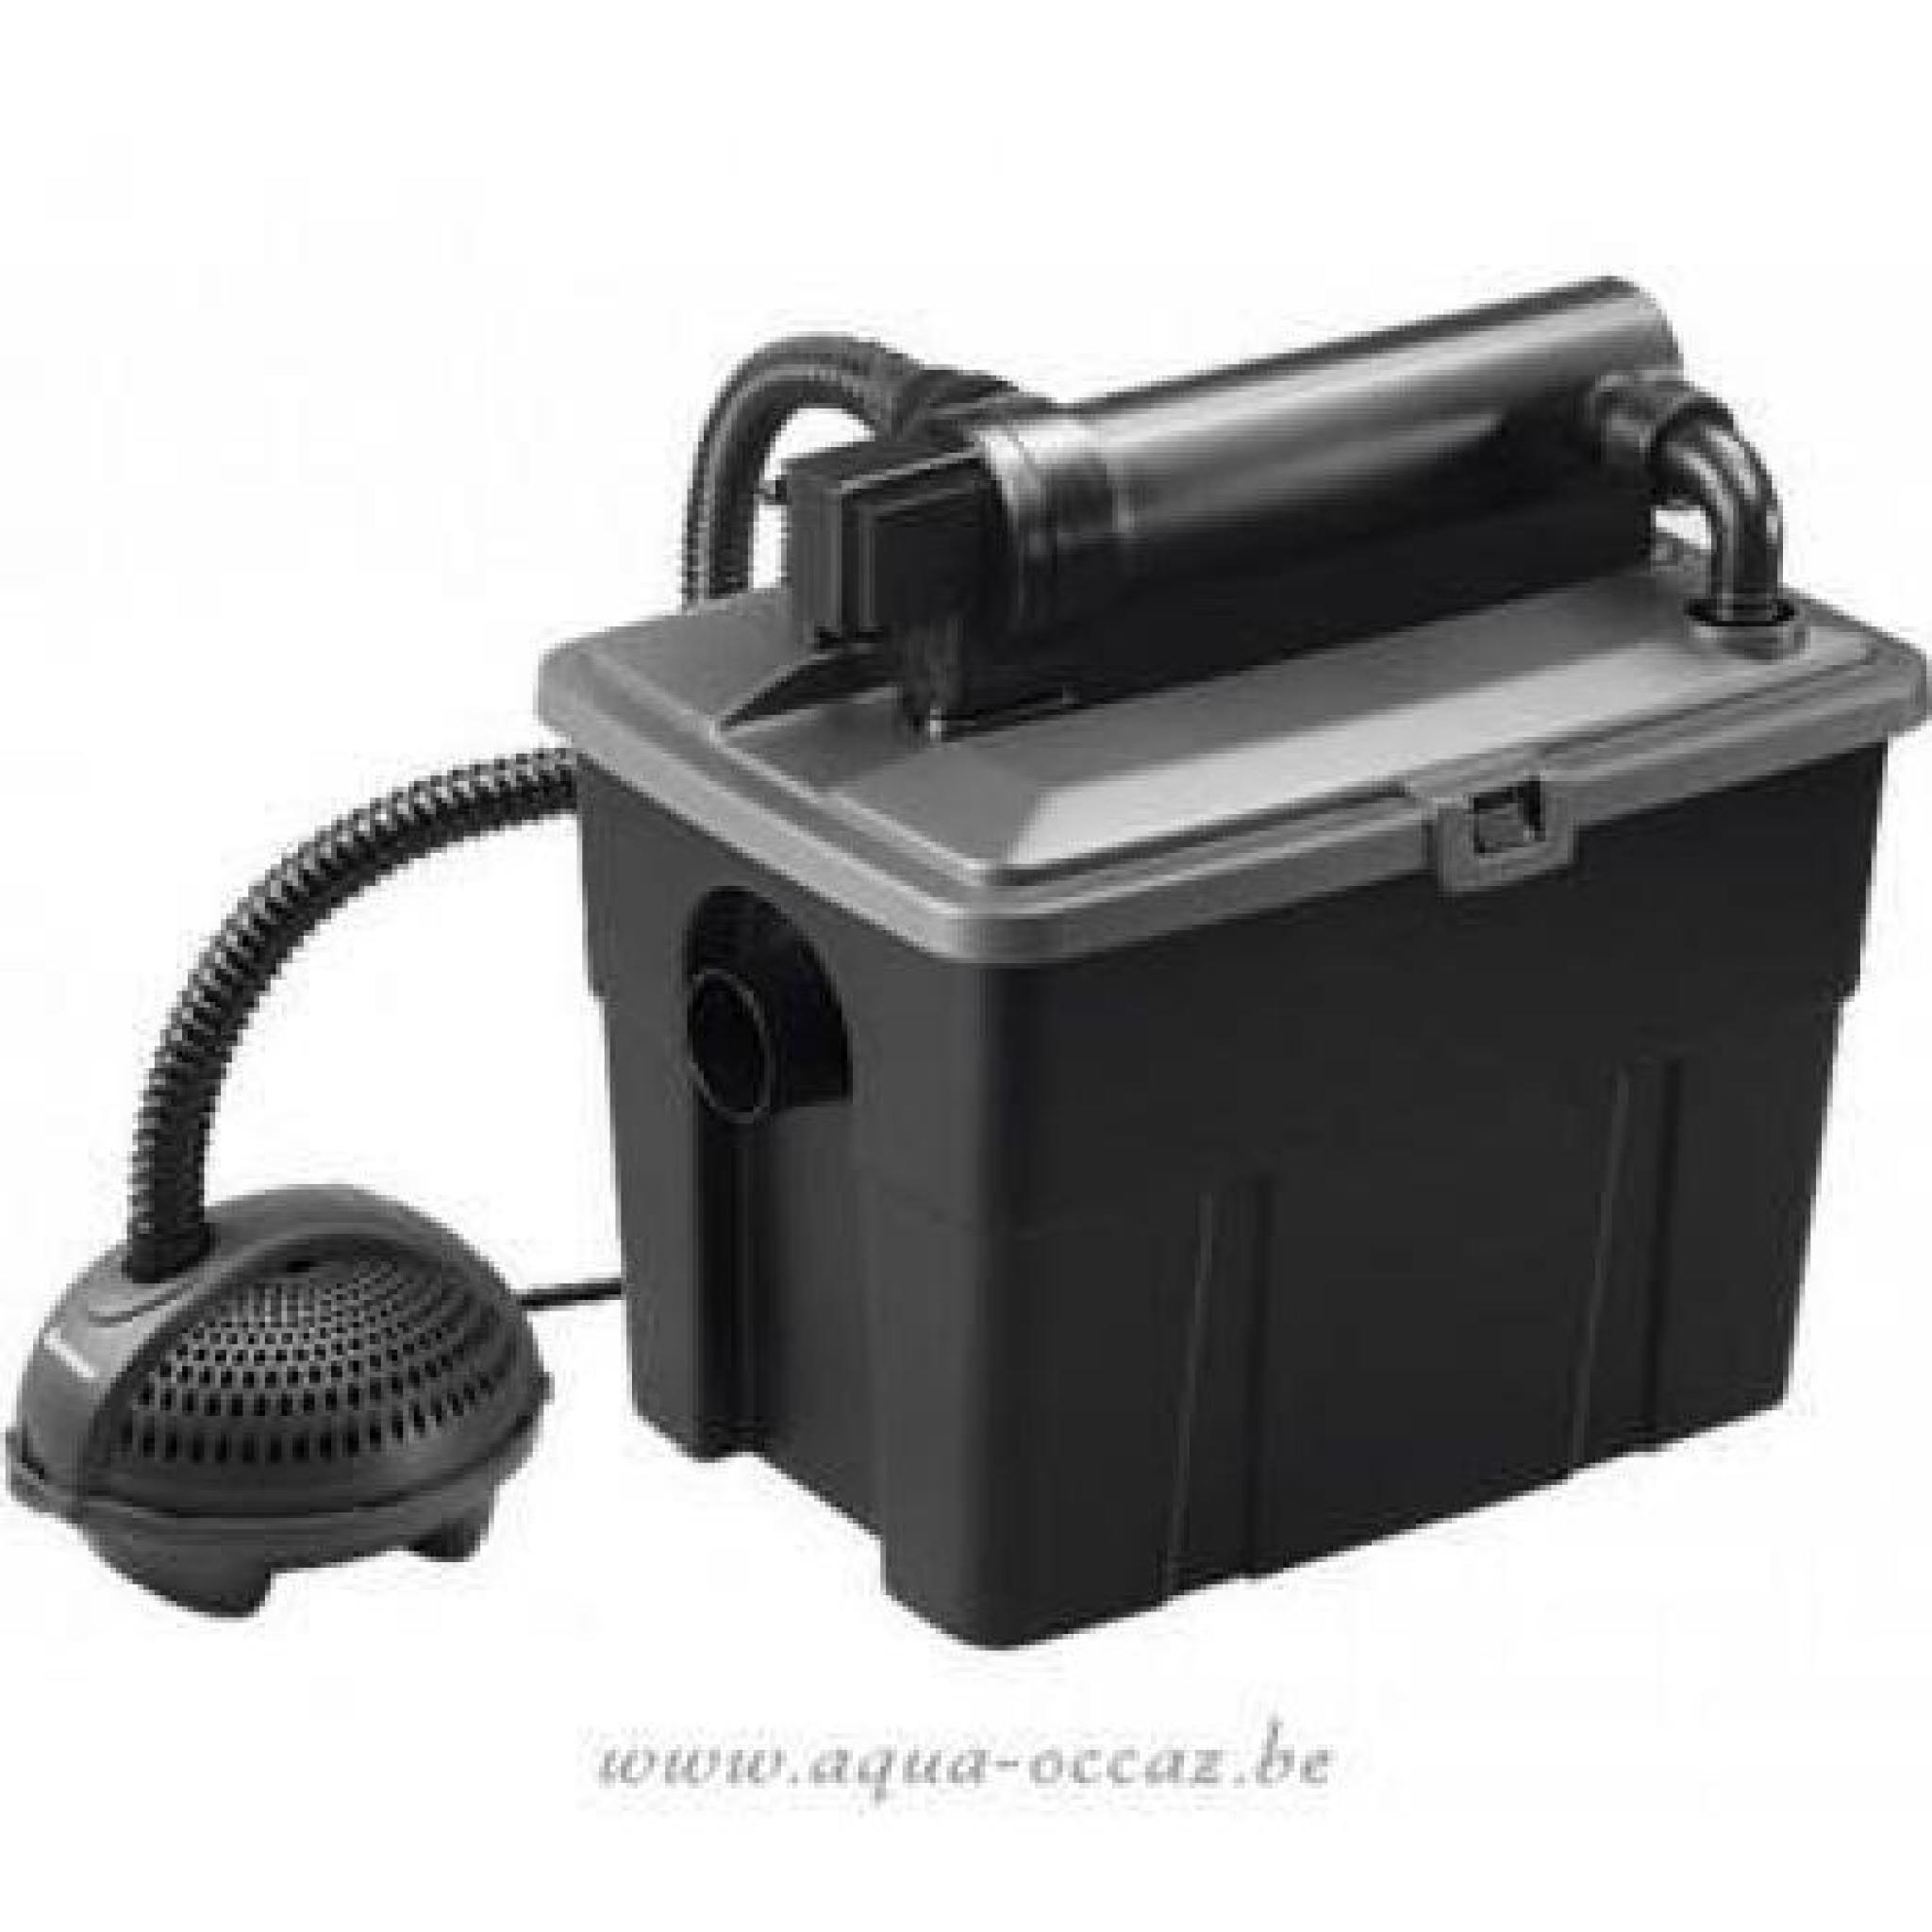 filtration compl te avec u v pour bassin de jardin 4000 8000 litres achat vente bassin de. Black Bedroom Furniture Sets. Home Design Ideas